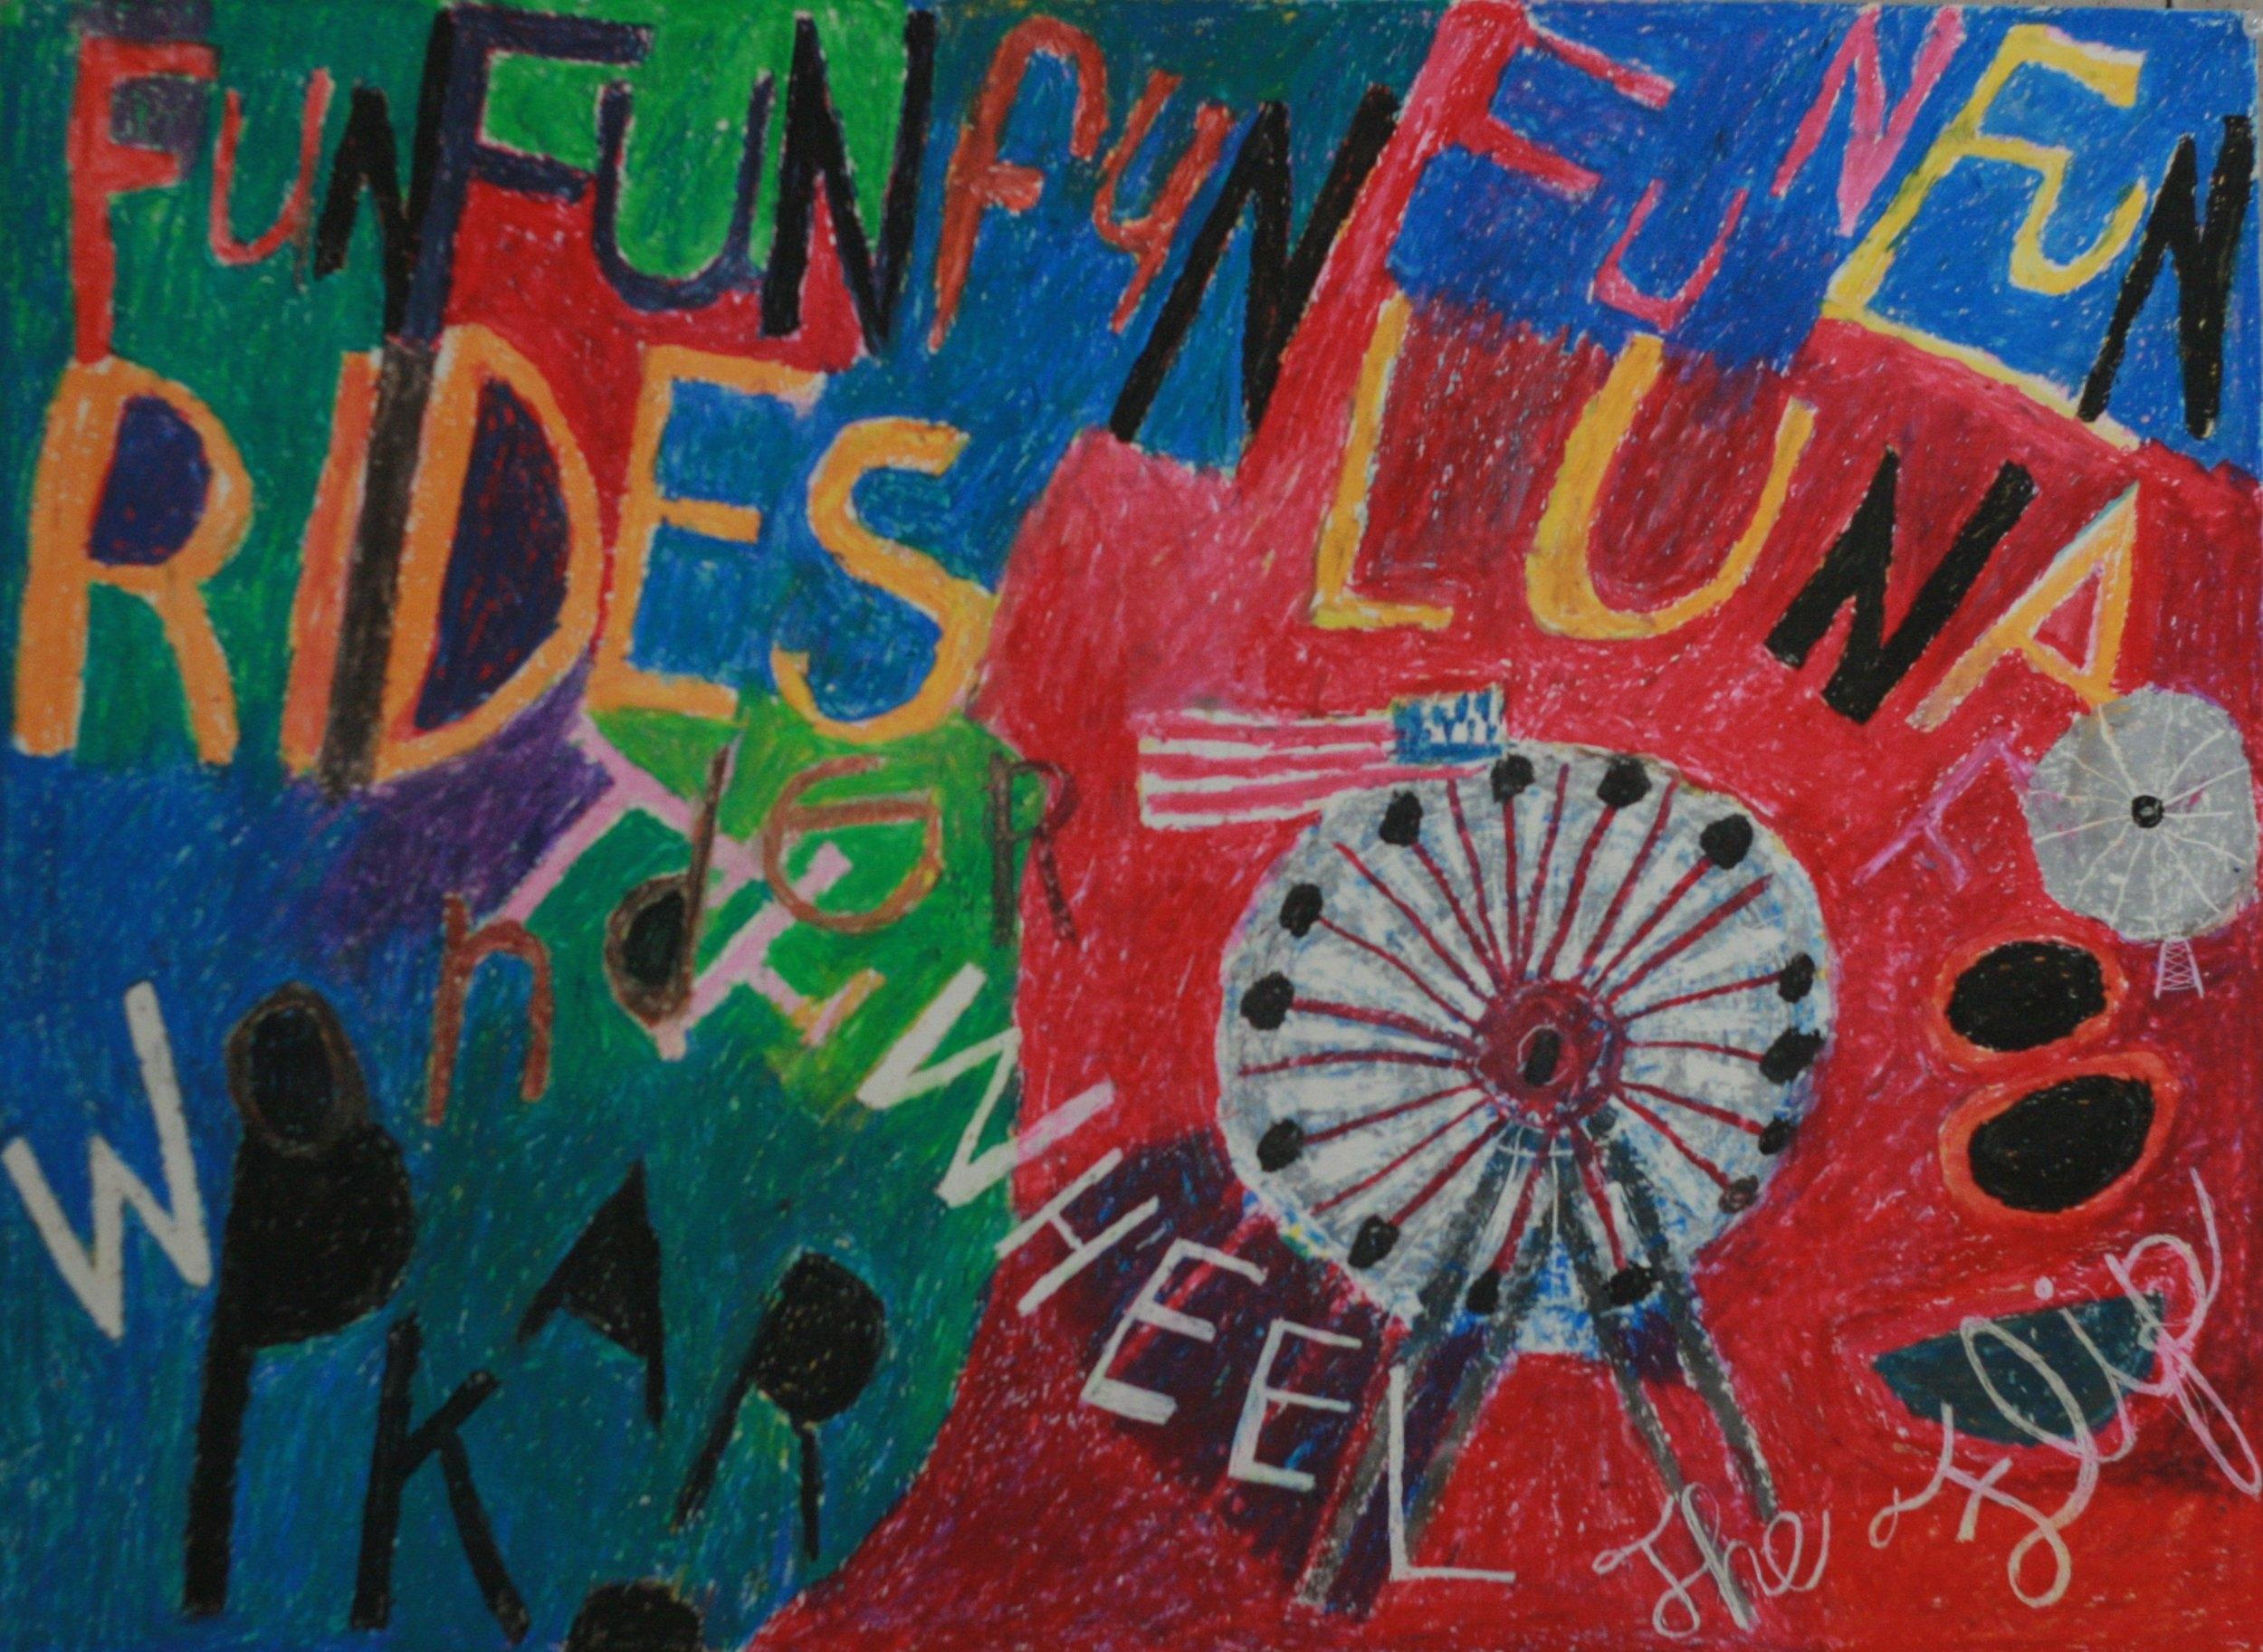 "Luna Rides. 22"" x 30."" Wax crayon on paper. 2016."